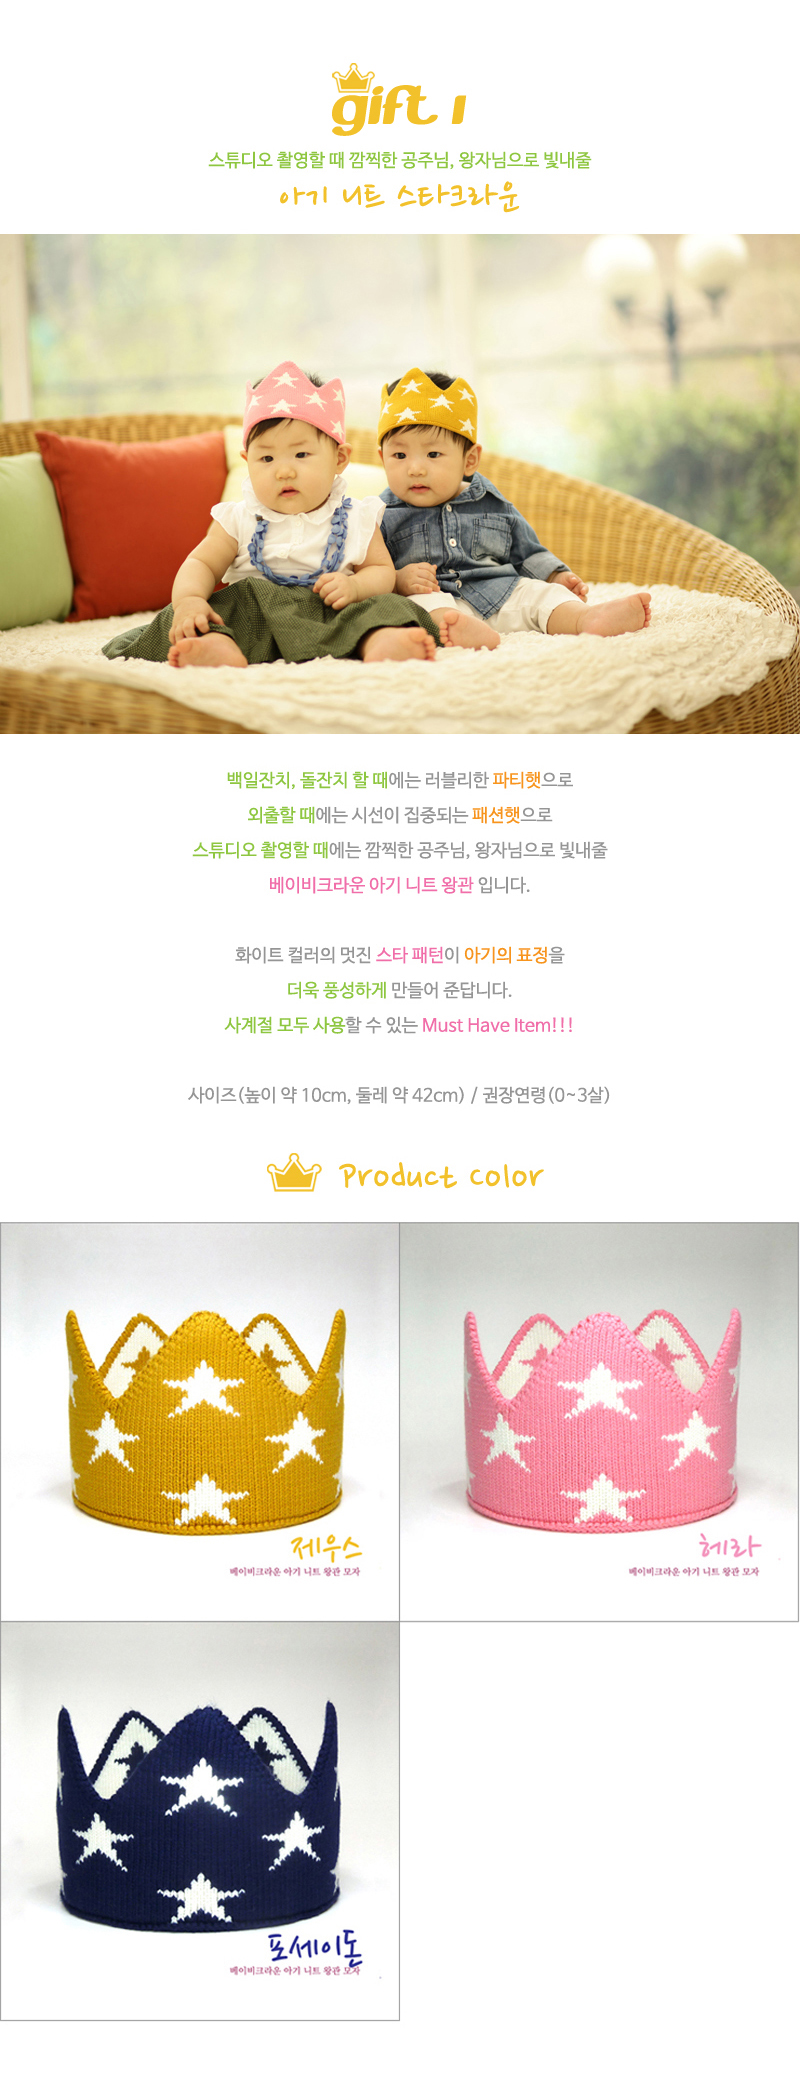 [ Babycrown ] [宝宝]皇冠婴儿礼品套装(幸福的狗)